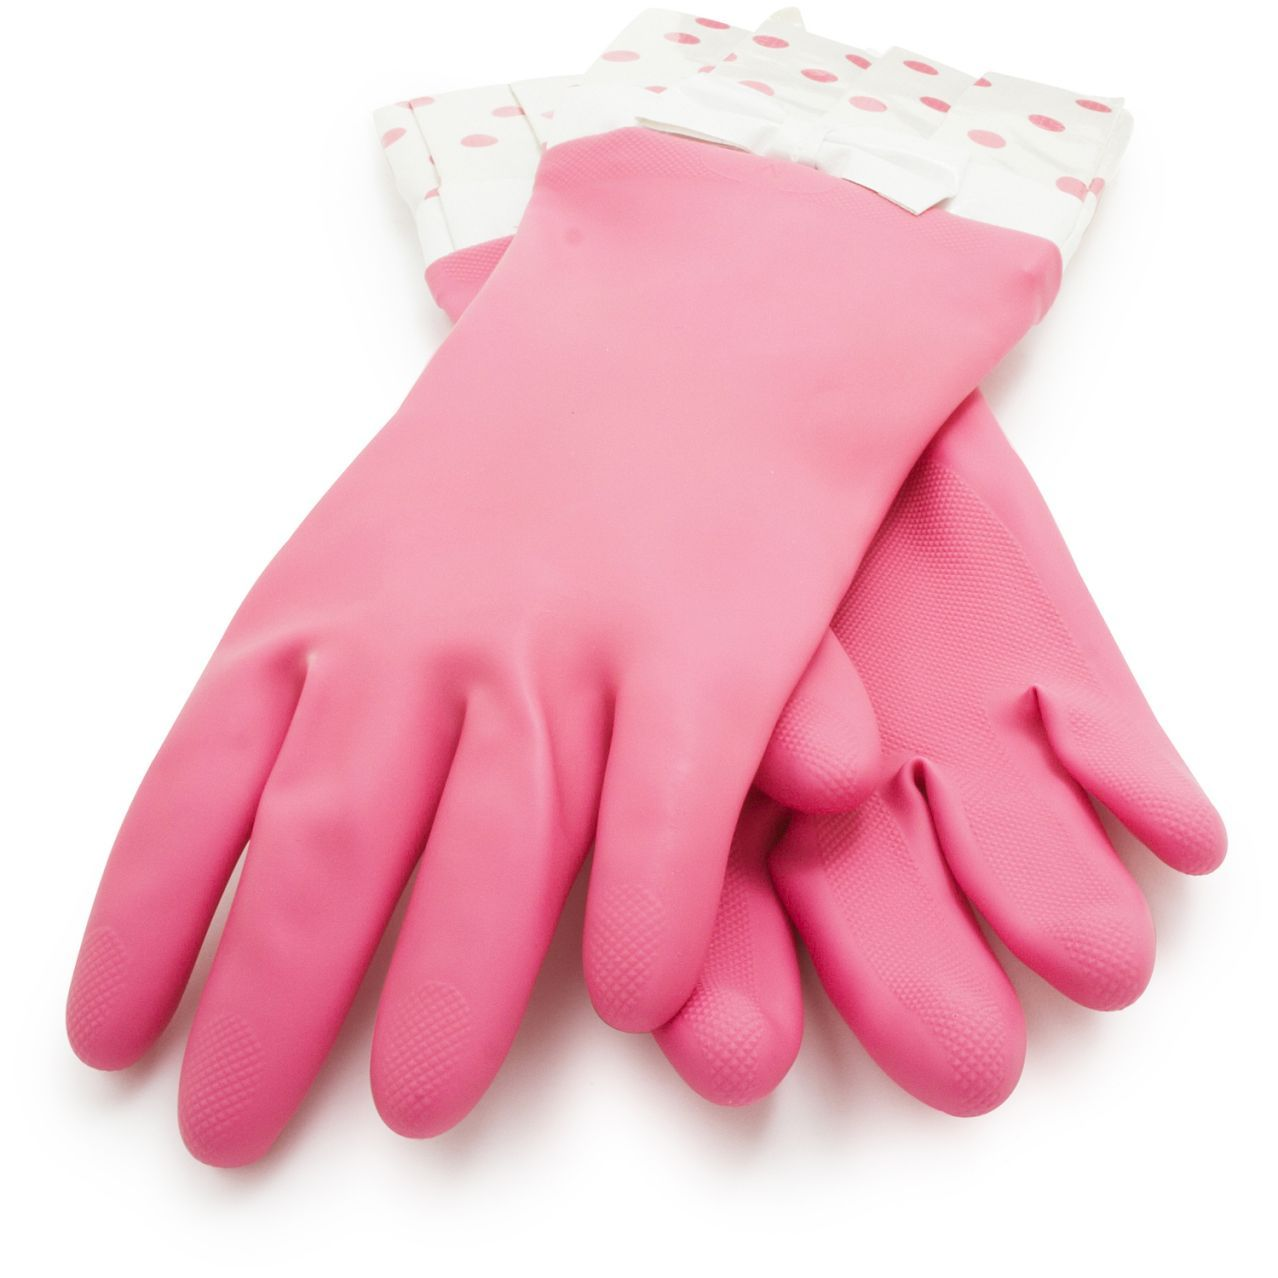 Gloveables cleaning gloves sur la table